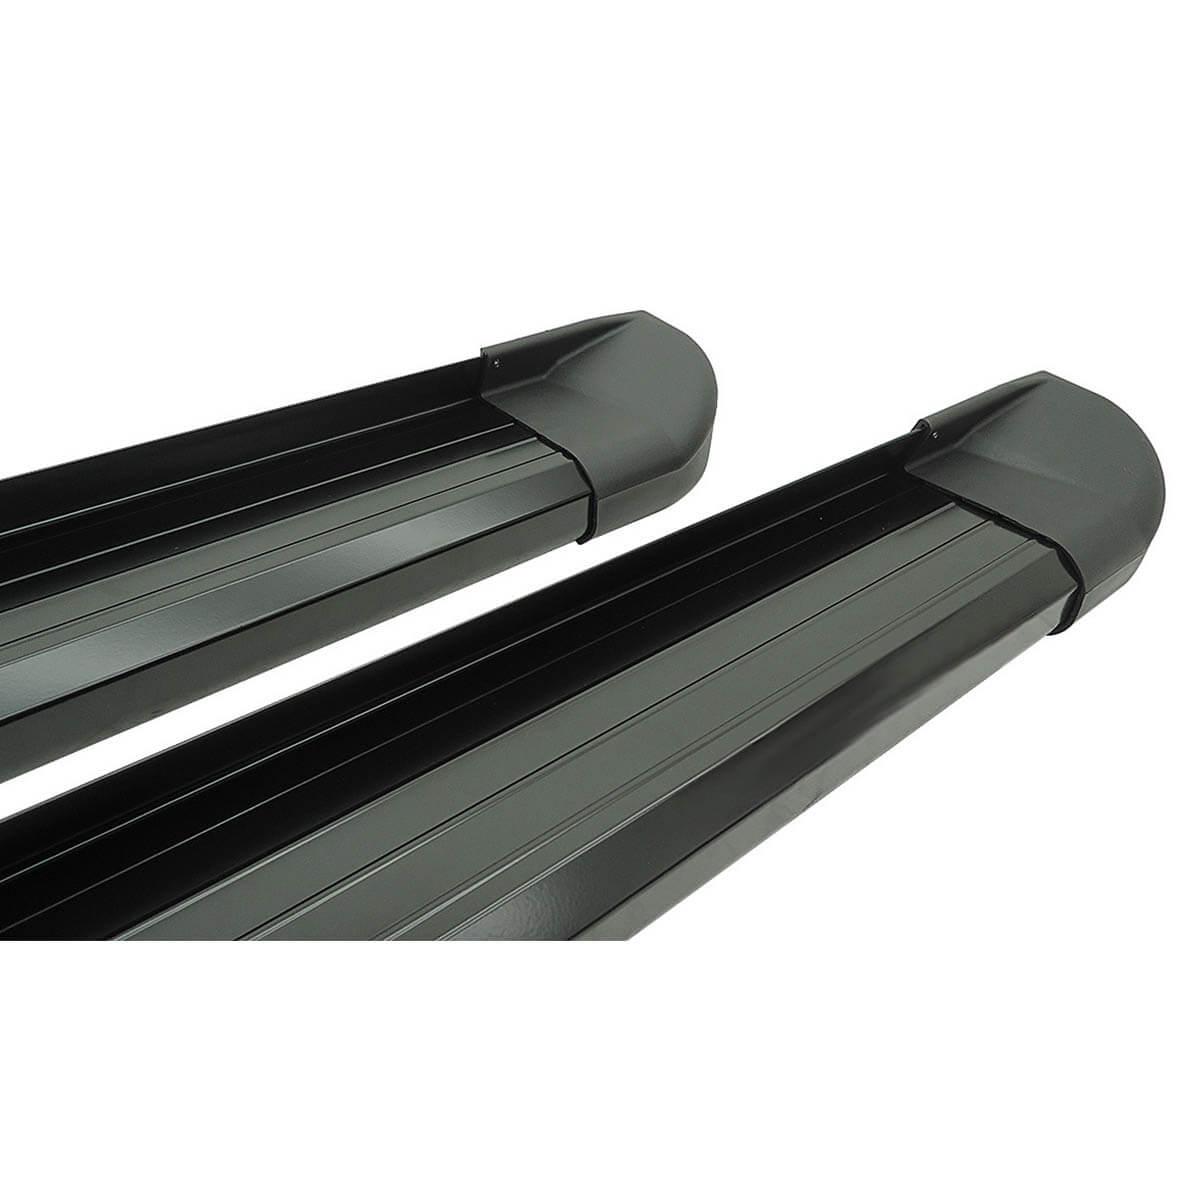 Estribo plataforma alumínio preto Ecosport 2003 a 2012